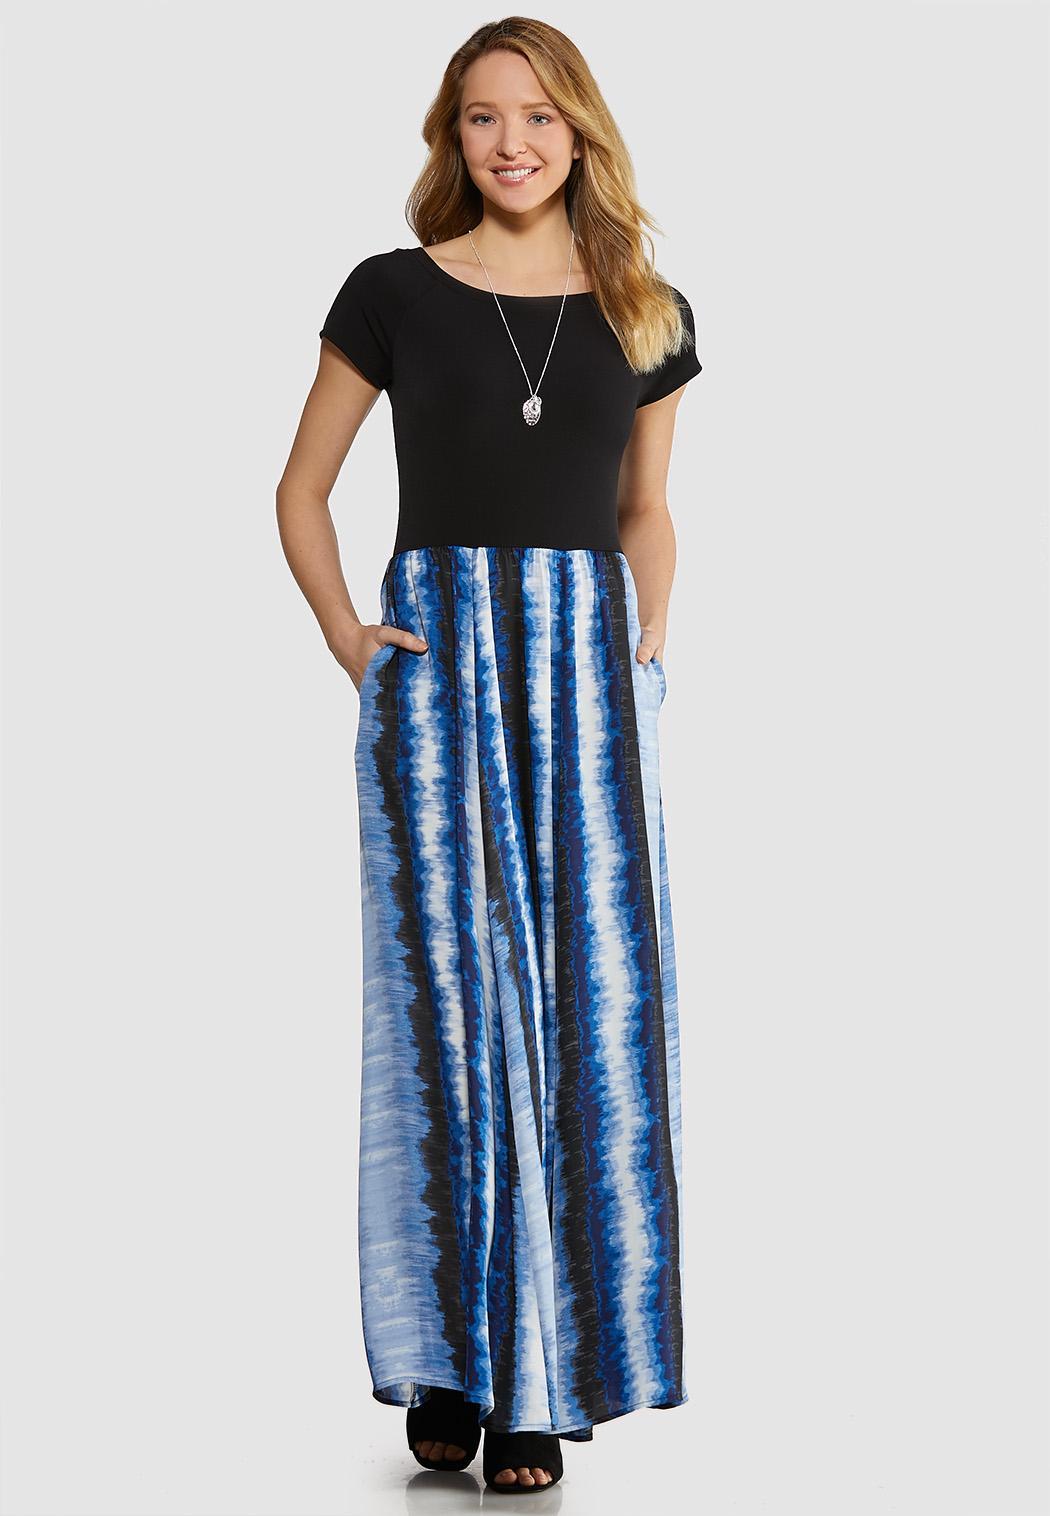 Plus Petite Solid Tie Dye Maxi Dress